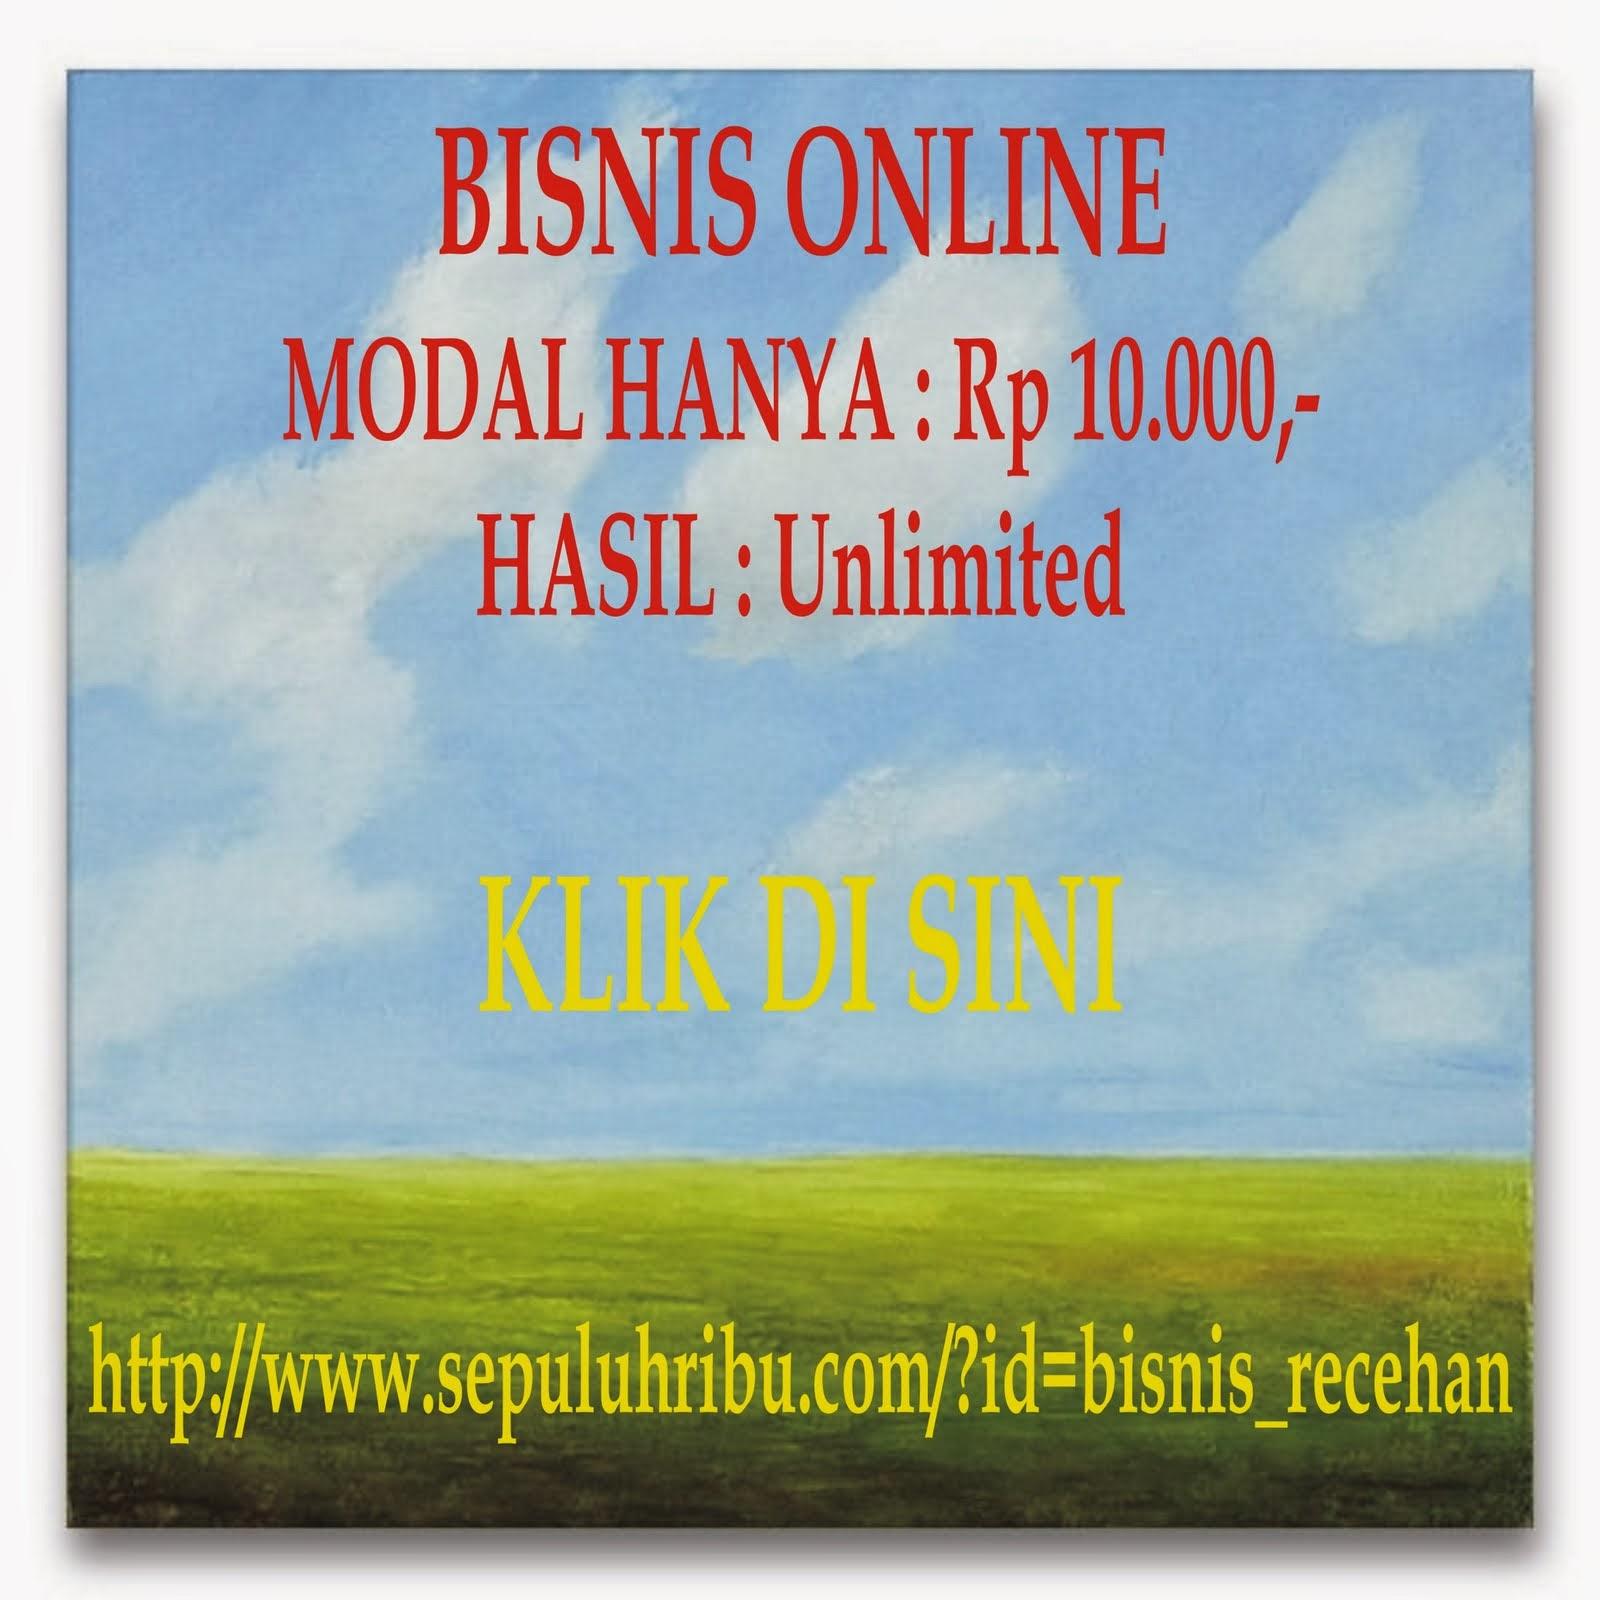 Peluang Bisnis Online Indonesia Modal Kecil Rp 10.000